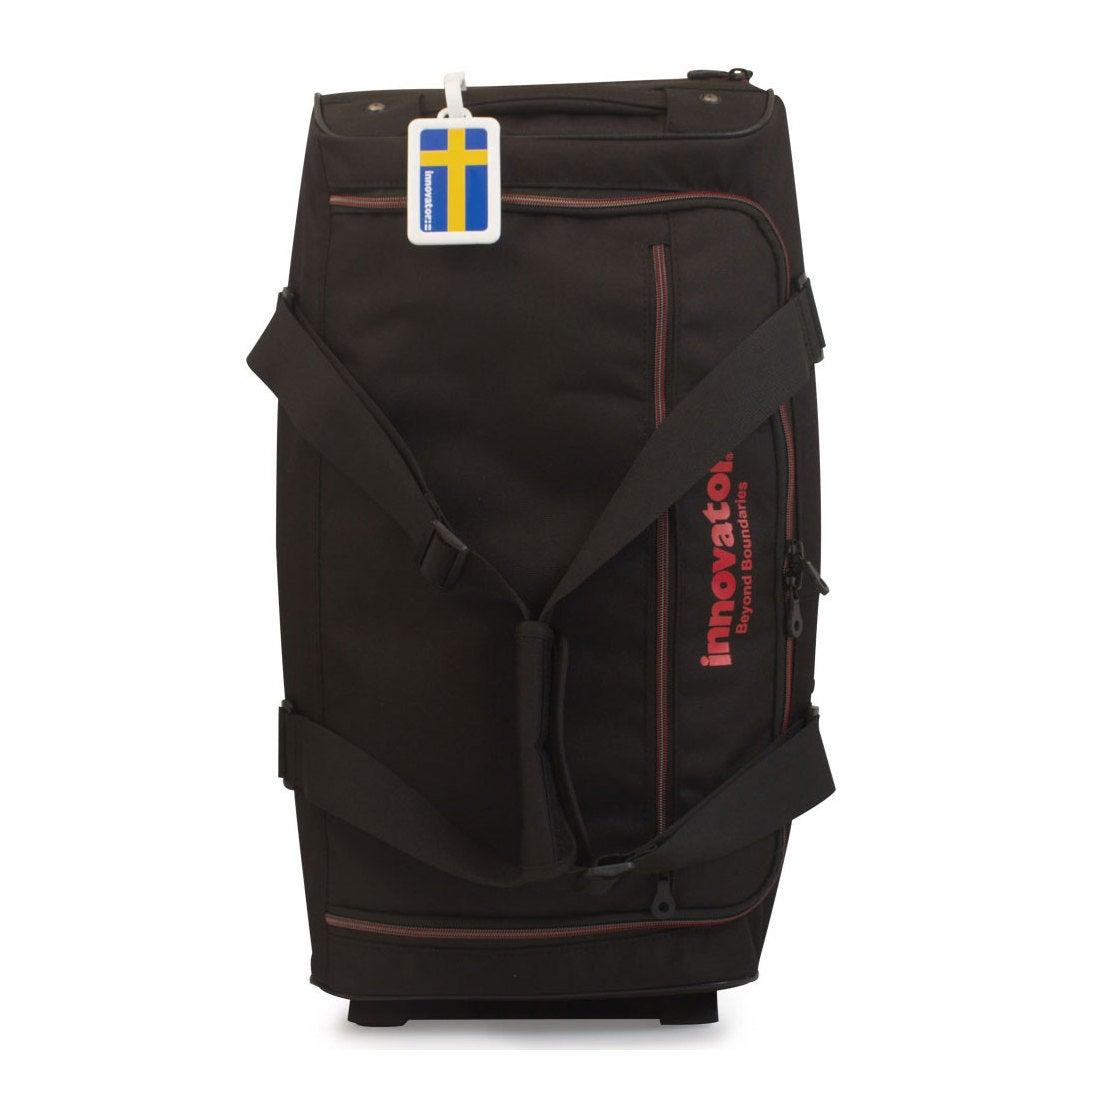 【SAC'S BAR】イノベーター innovator スーツケース GI-5322CD 66cm GIコーデュラ BLACK/RED メンズ